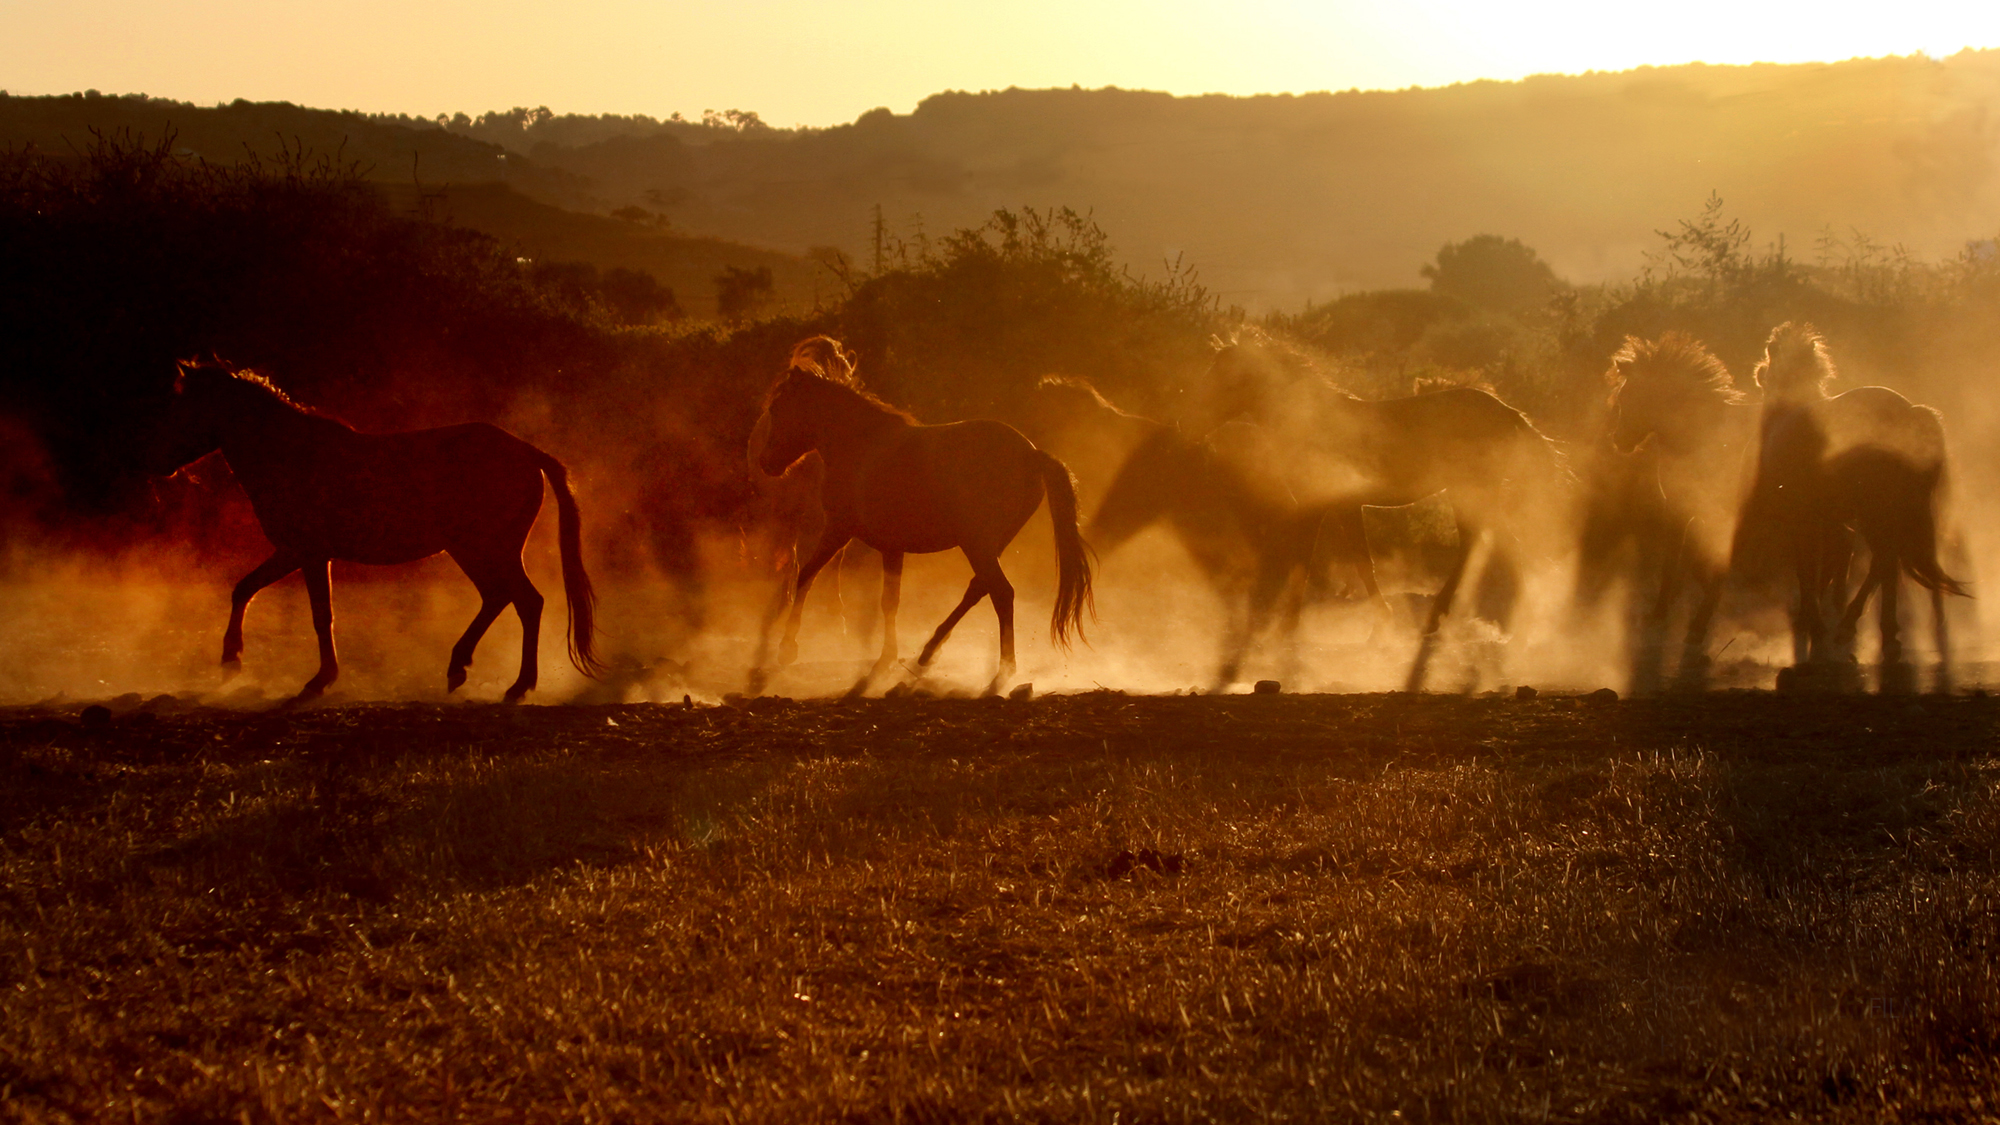 Horses on the island of Skyros, Greece. Photo: Jen Miller